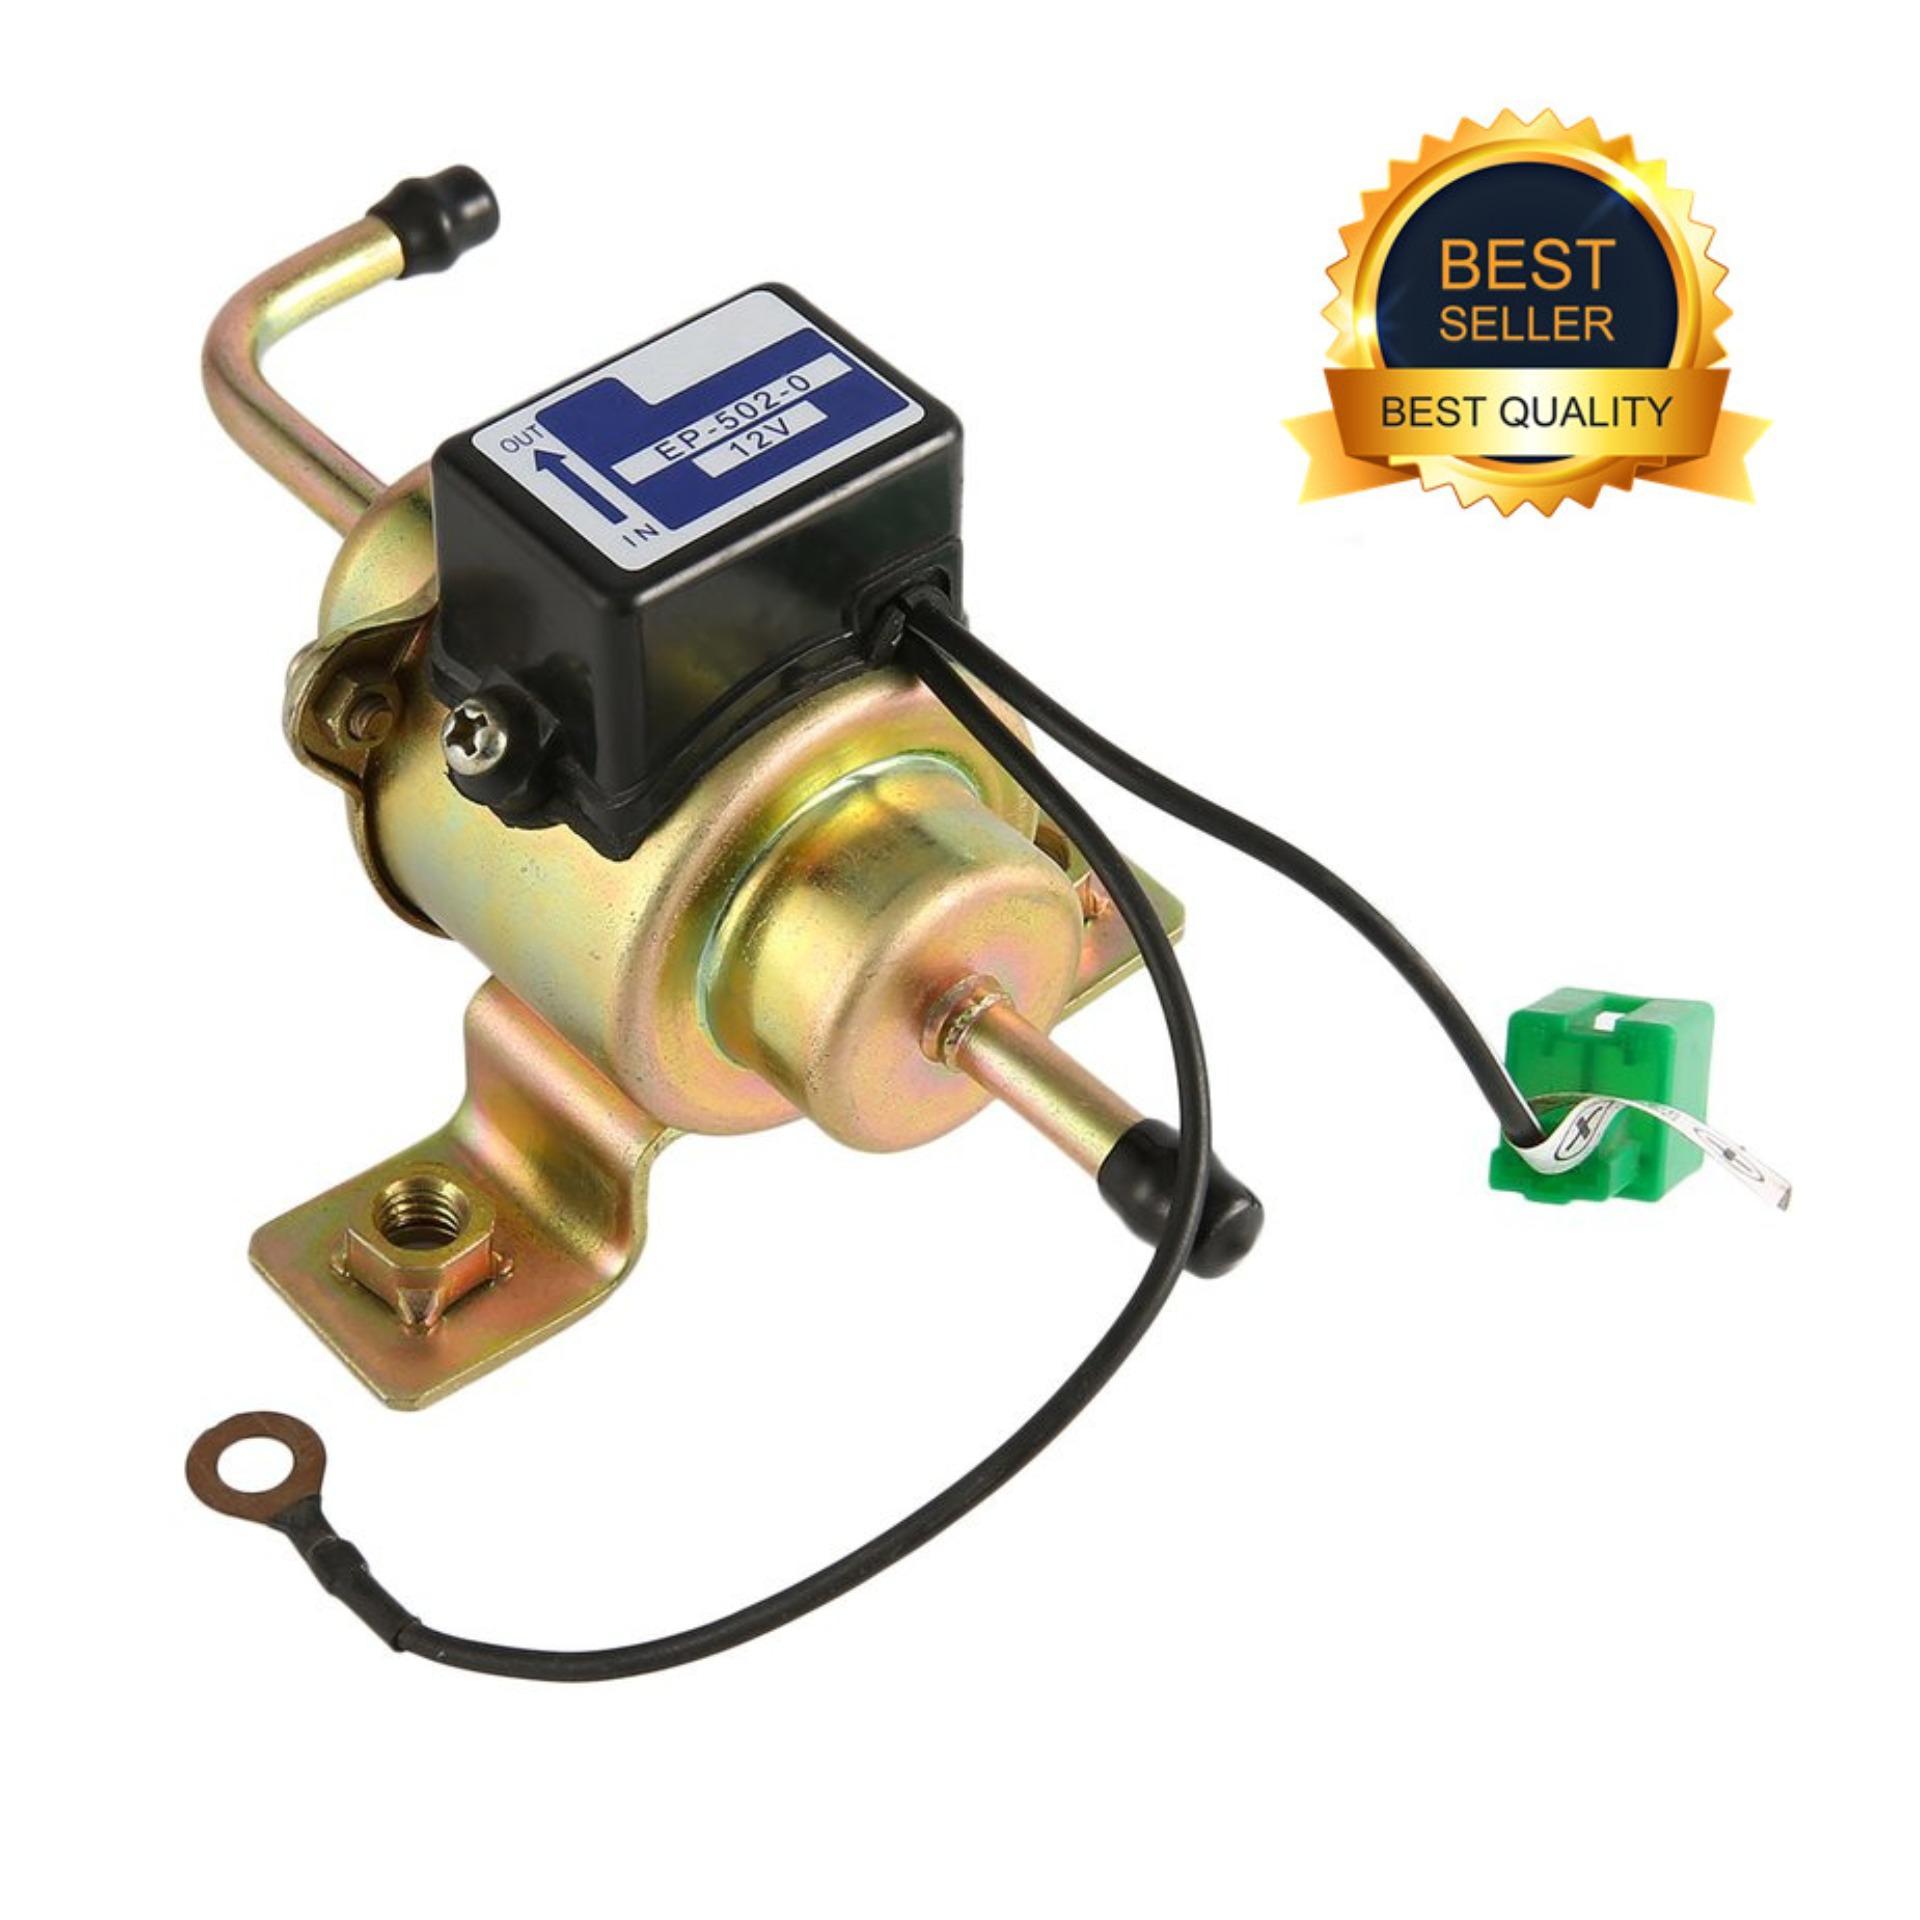 LIFEF 12V Auto Car Gas Electric Fuel Pump 5PSI External Electronic Pump